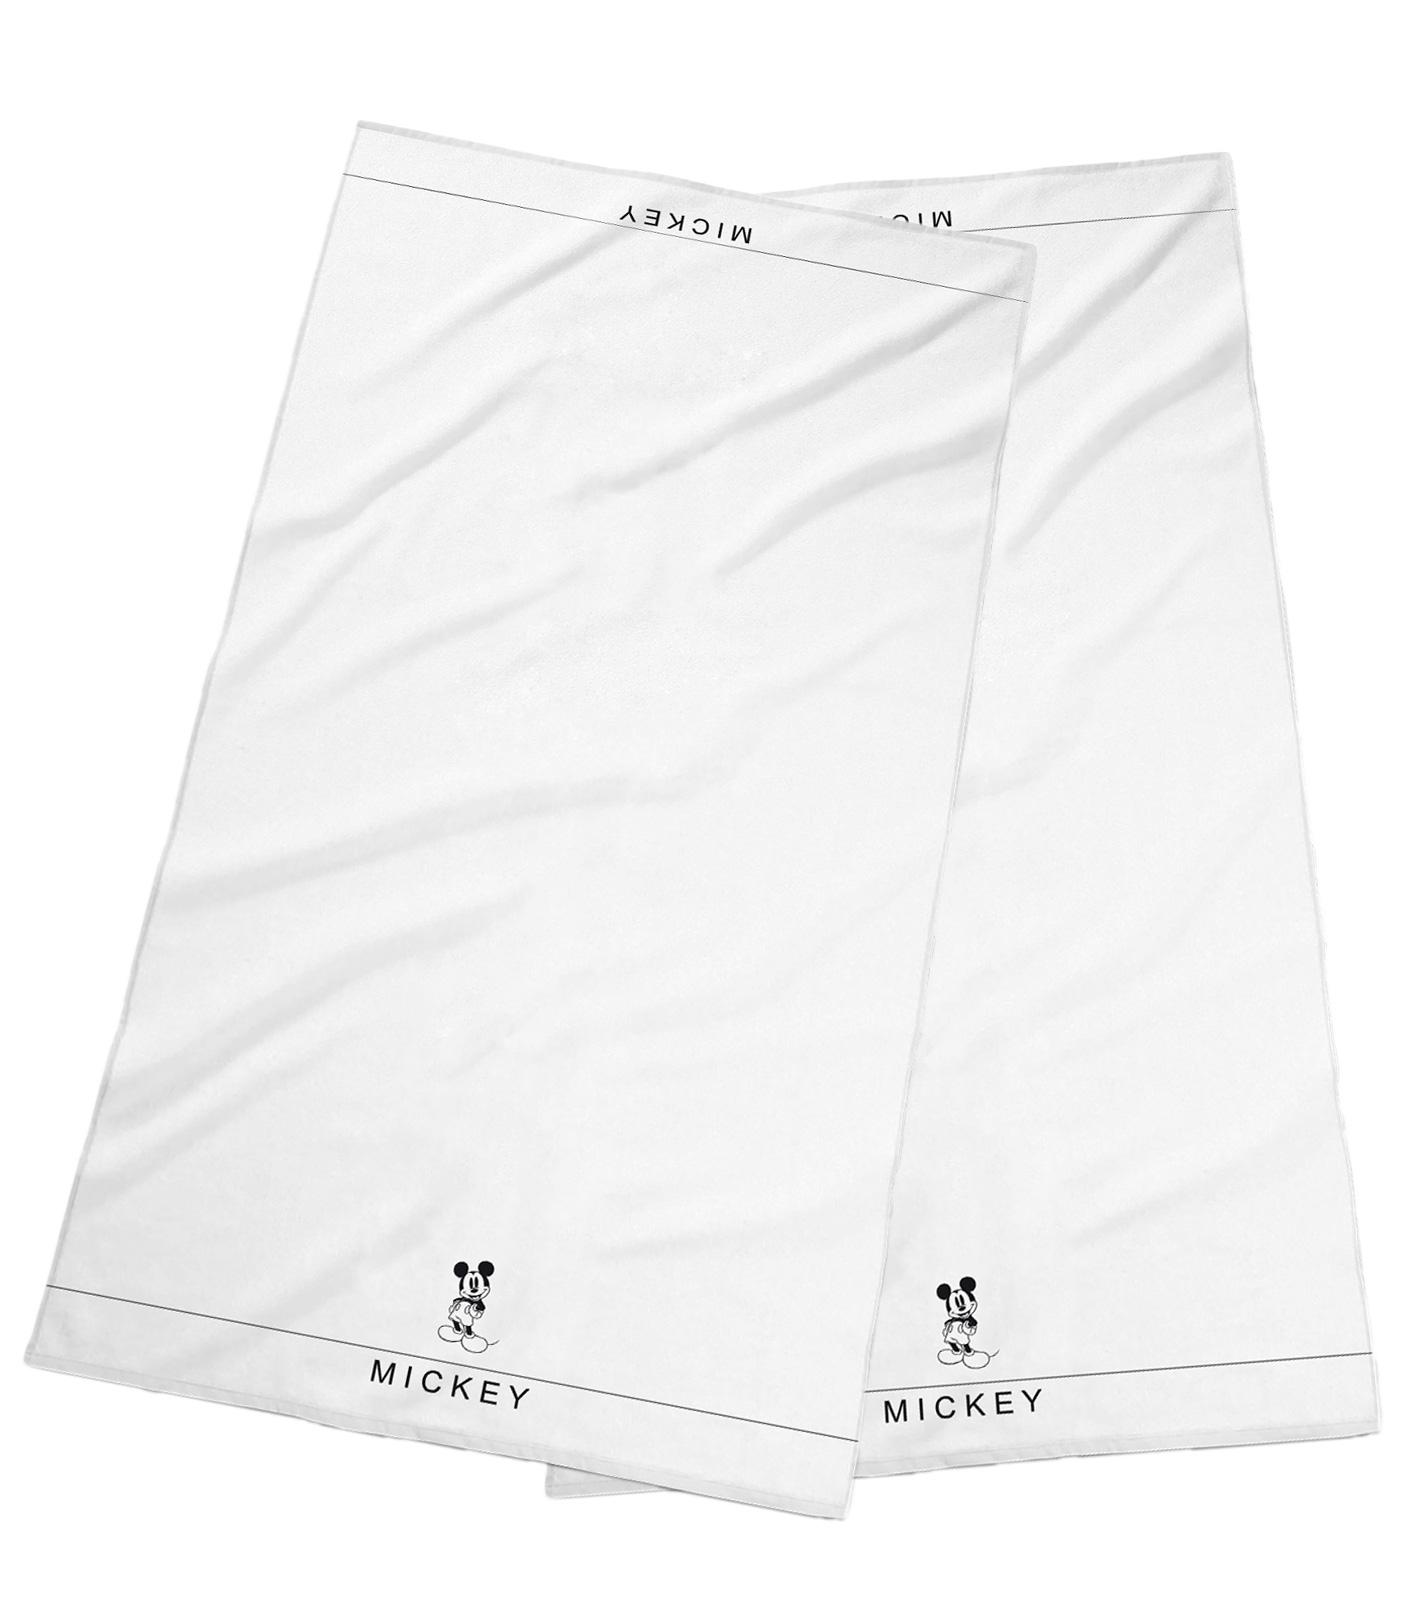 Badtextilien - 2er Pack Disney Frottee Handtuch Mickey Mouse 50x100 weiß  - Onlineshop PremiumShop321